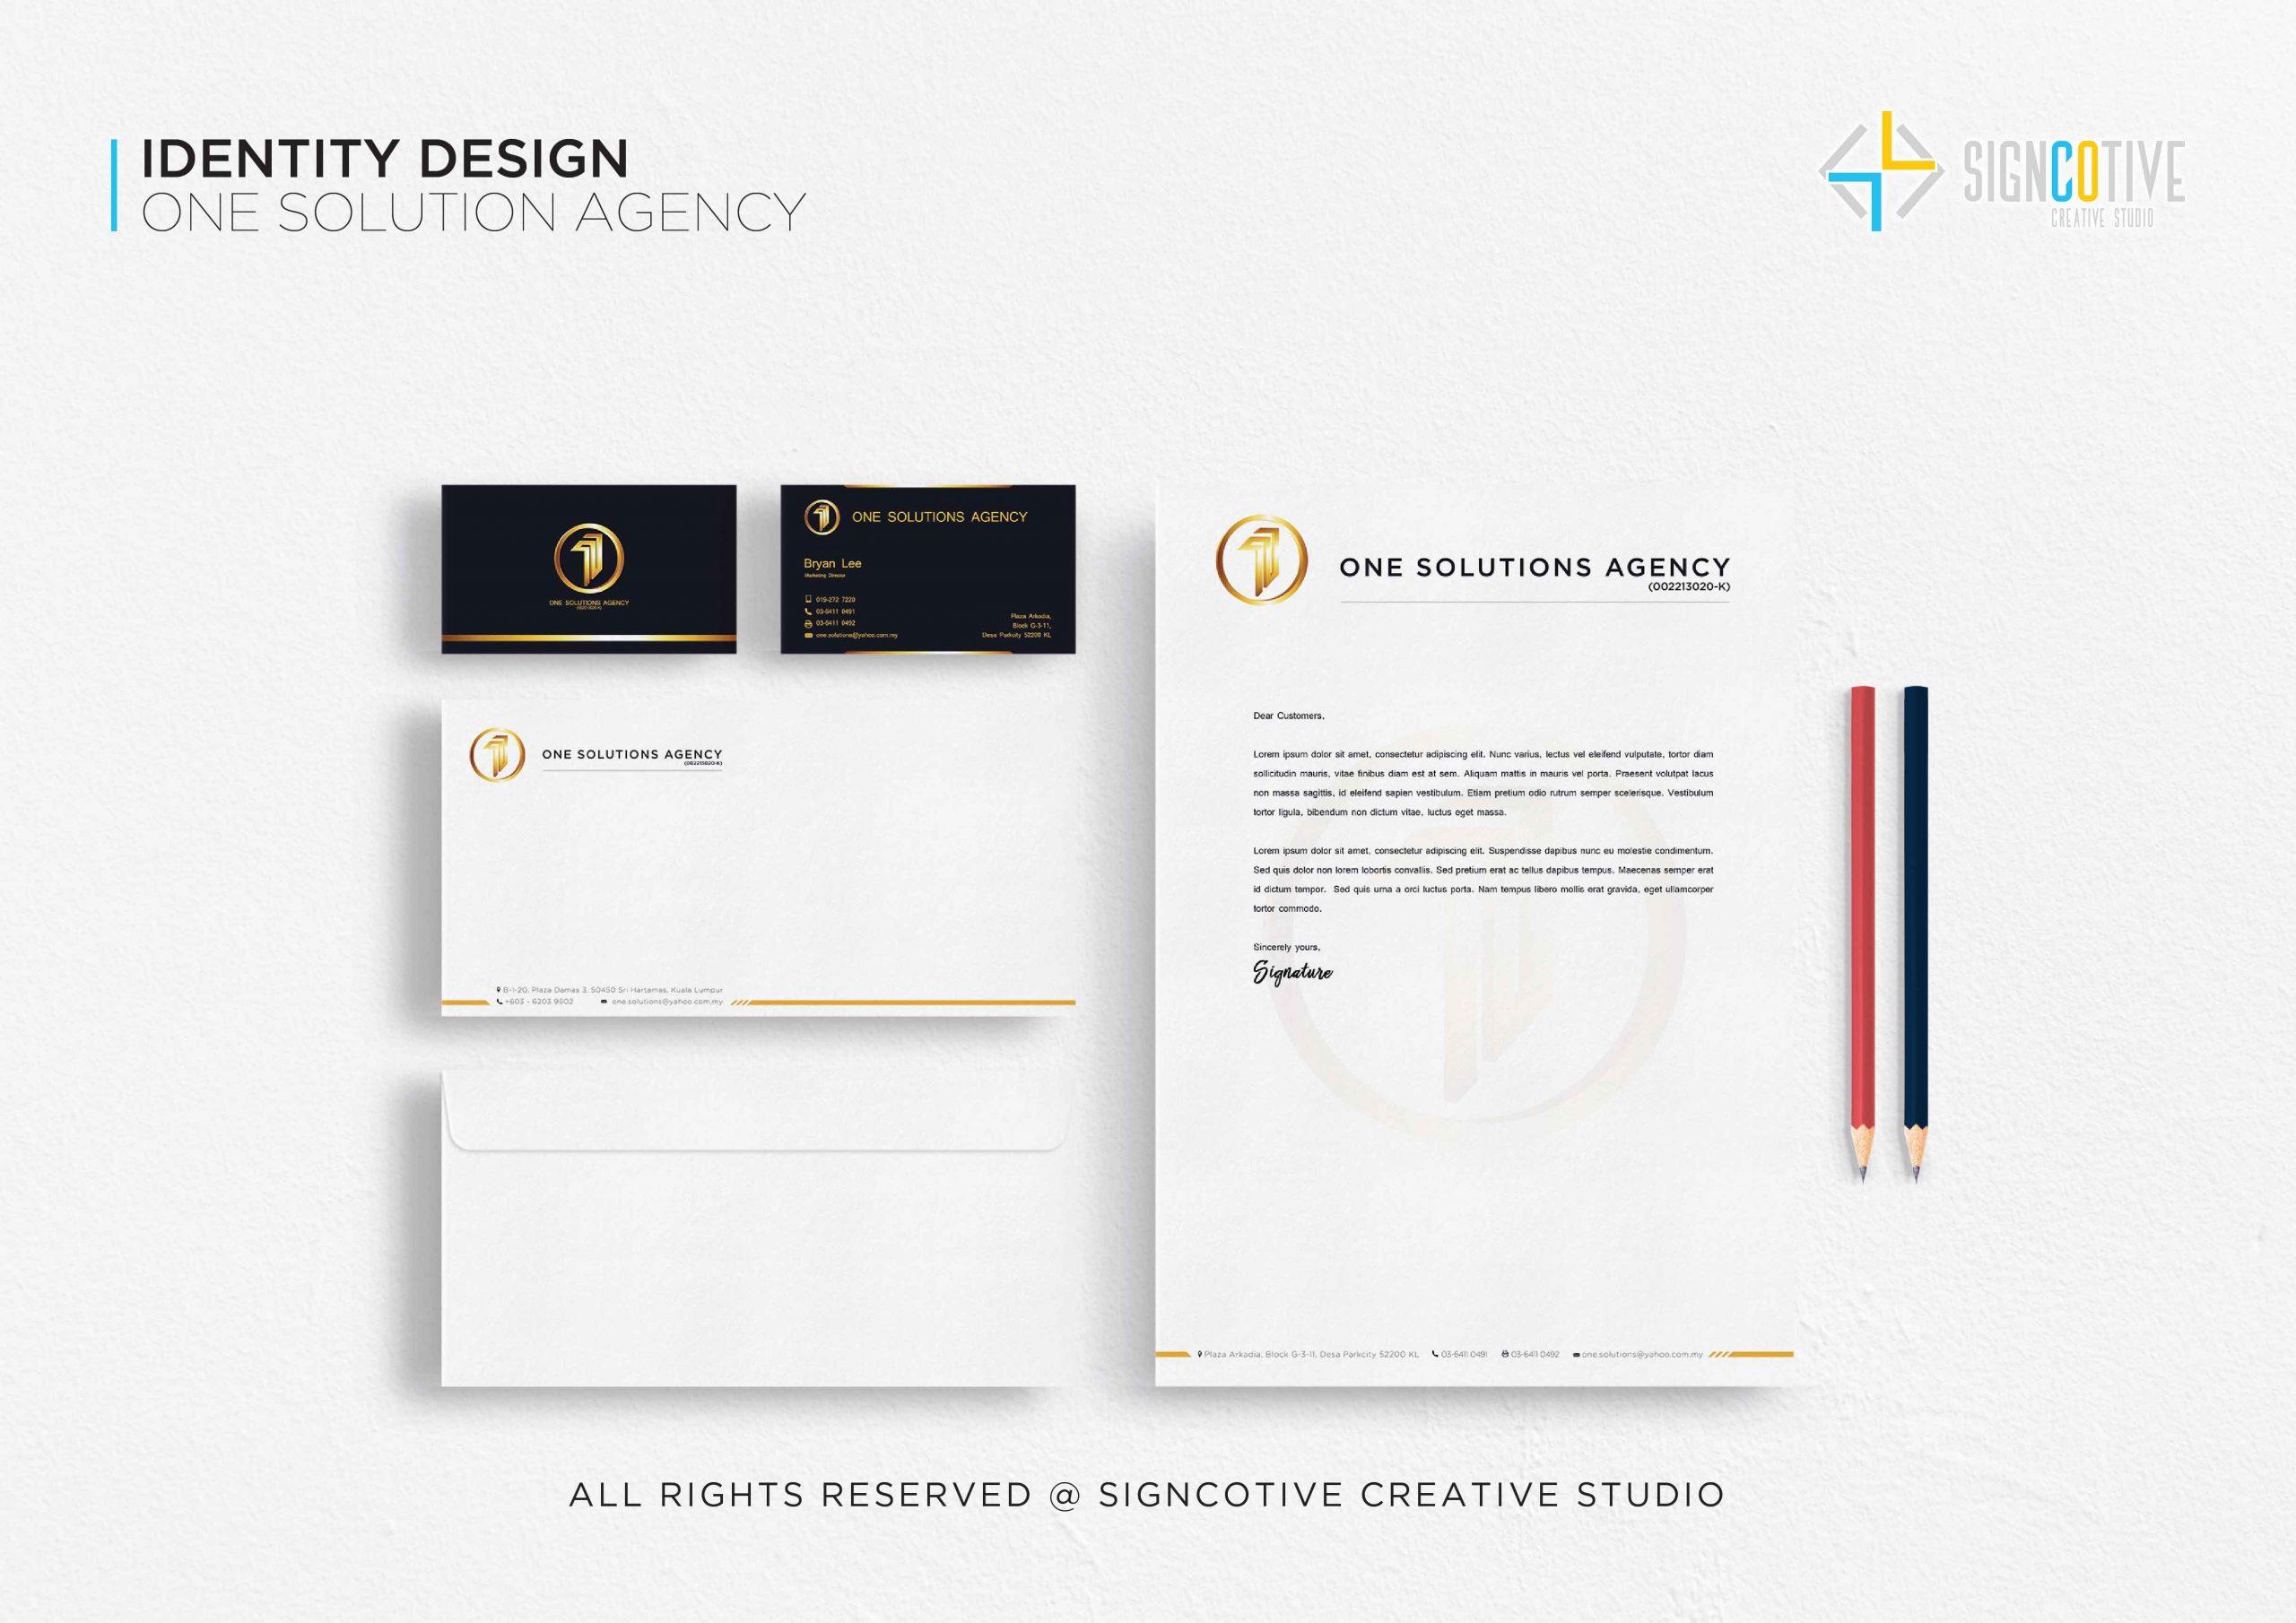 CIS Design